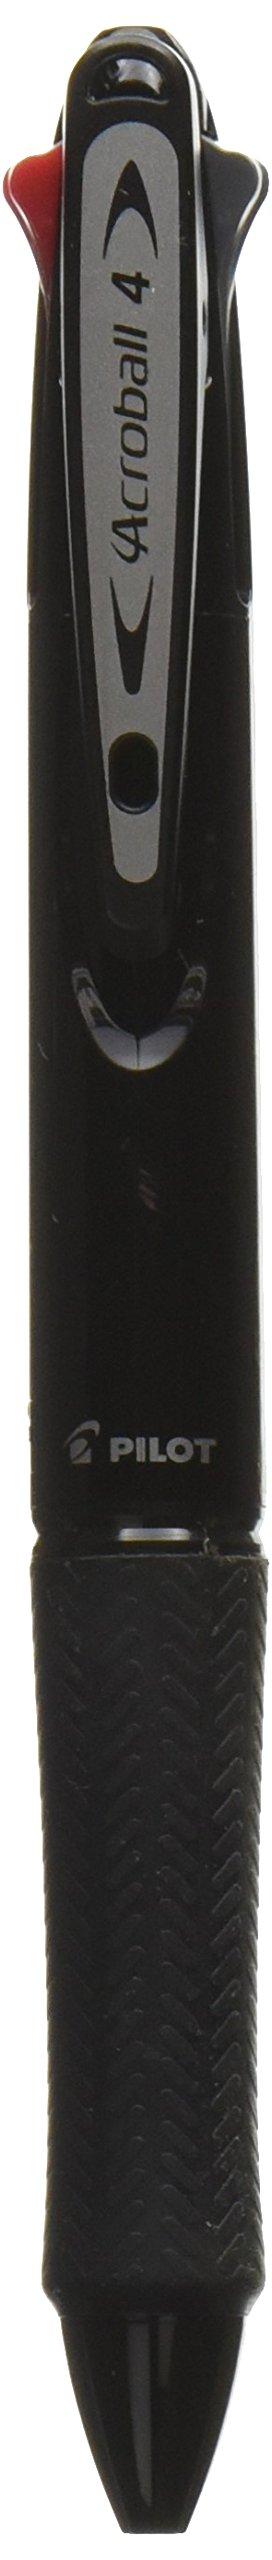 Pilot 4 Colors Ballpoint Pen, Acroball 4 Fine, Black, Red,..